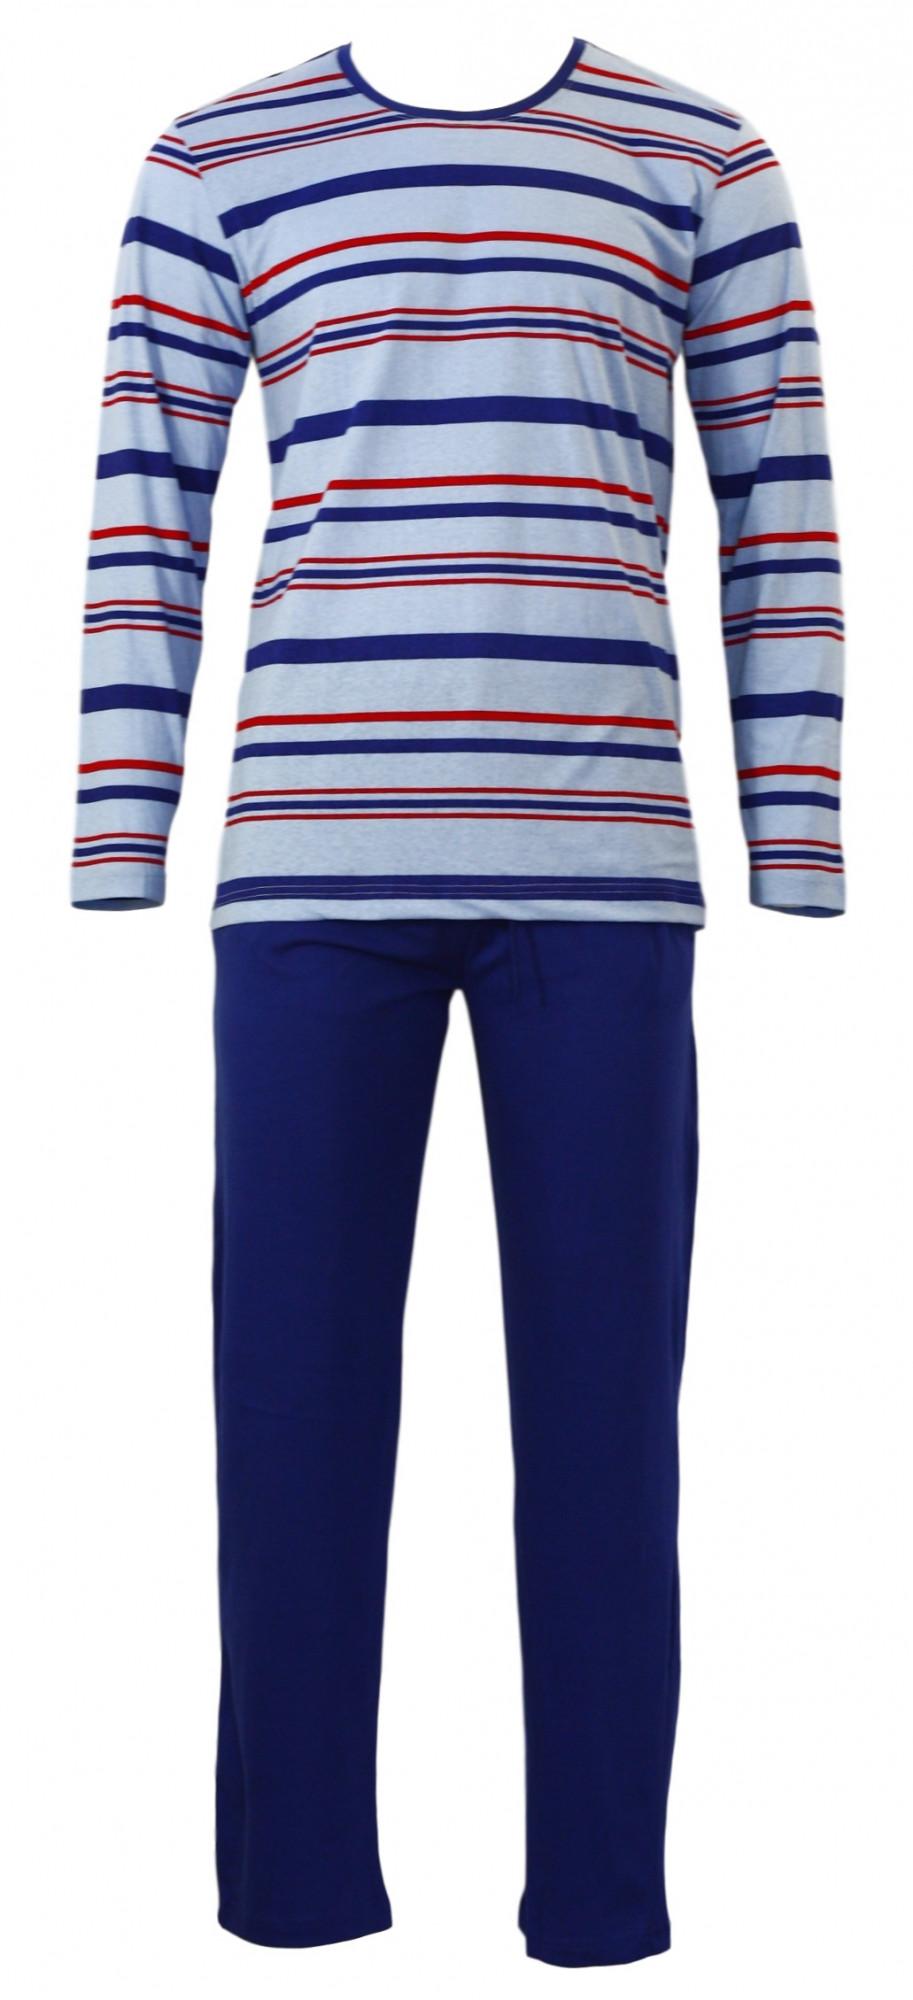 Pánské pyžamo Gazzaz 4497 Barva: černá -pruh, Velikost: XL